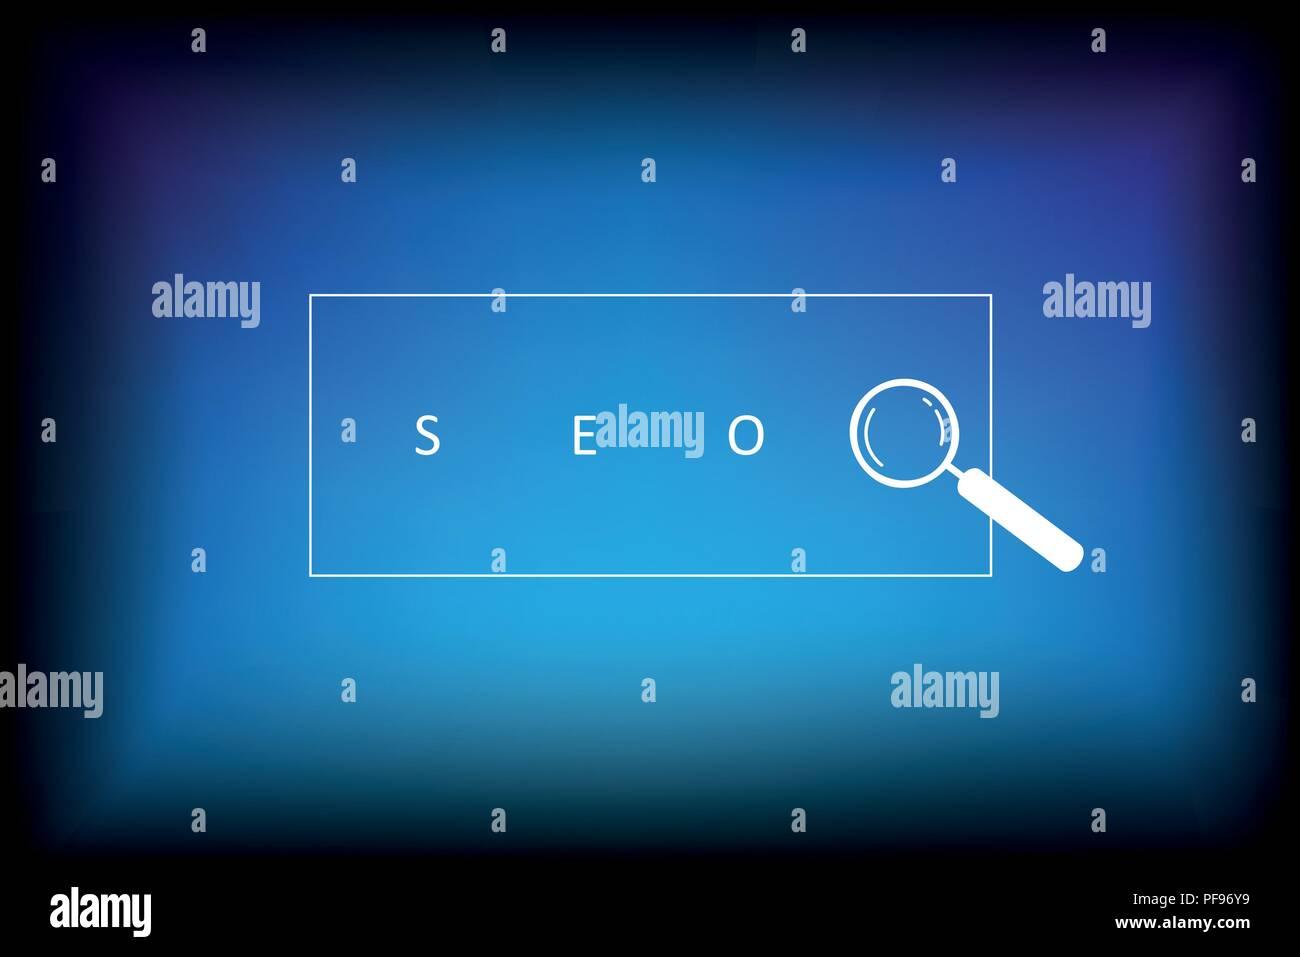 seo search design blue background vector illustration EPS10 - Stock Vector